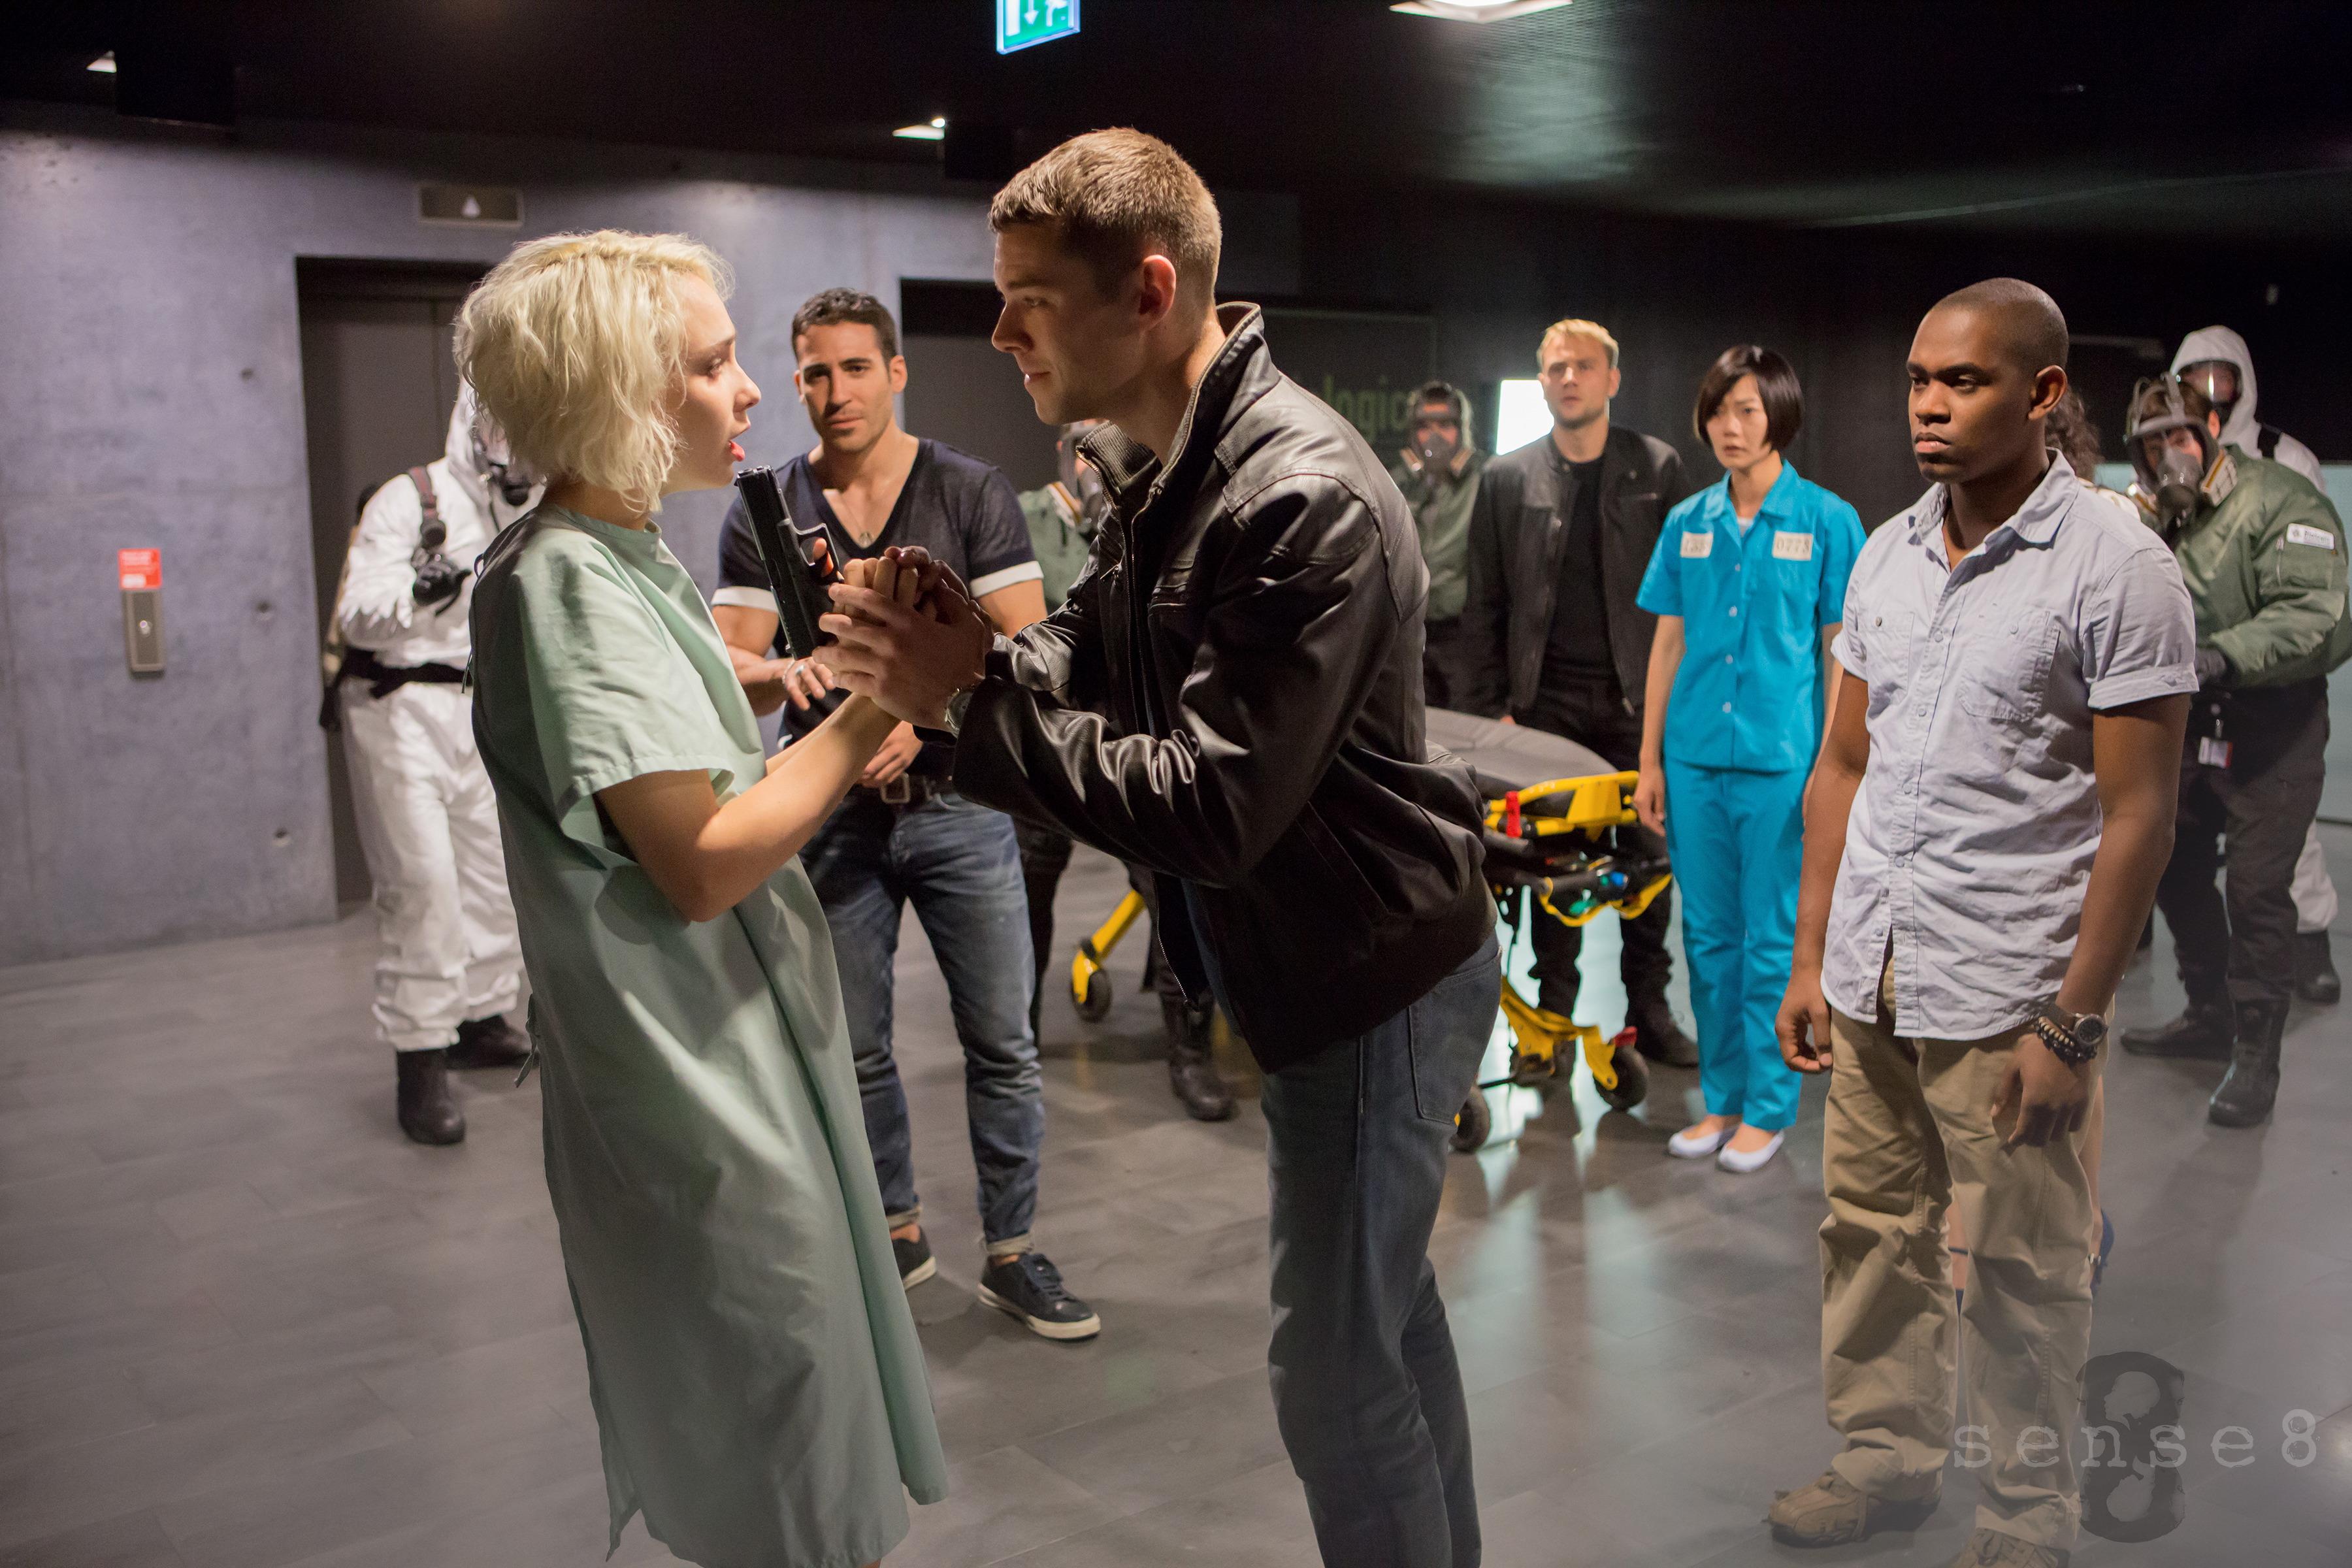 Sense8' Season 2: Why We're Still Waiting To Hear Good News